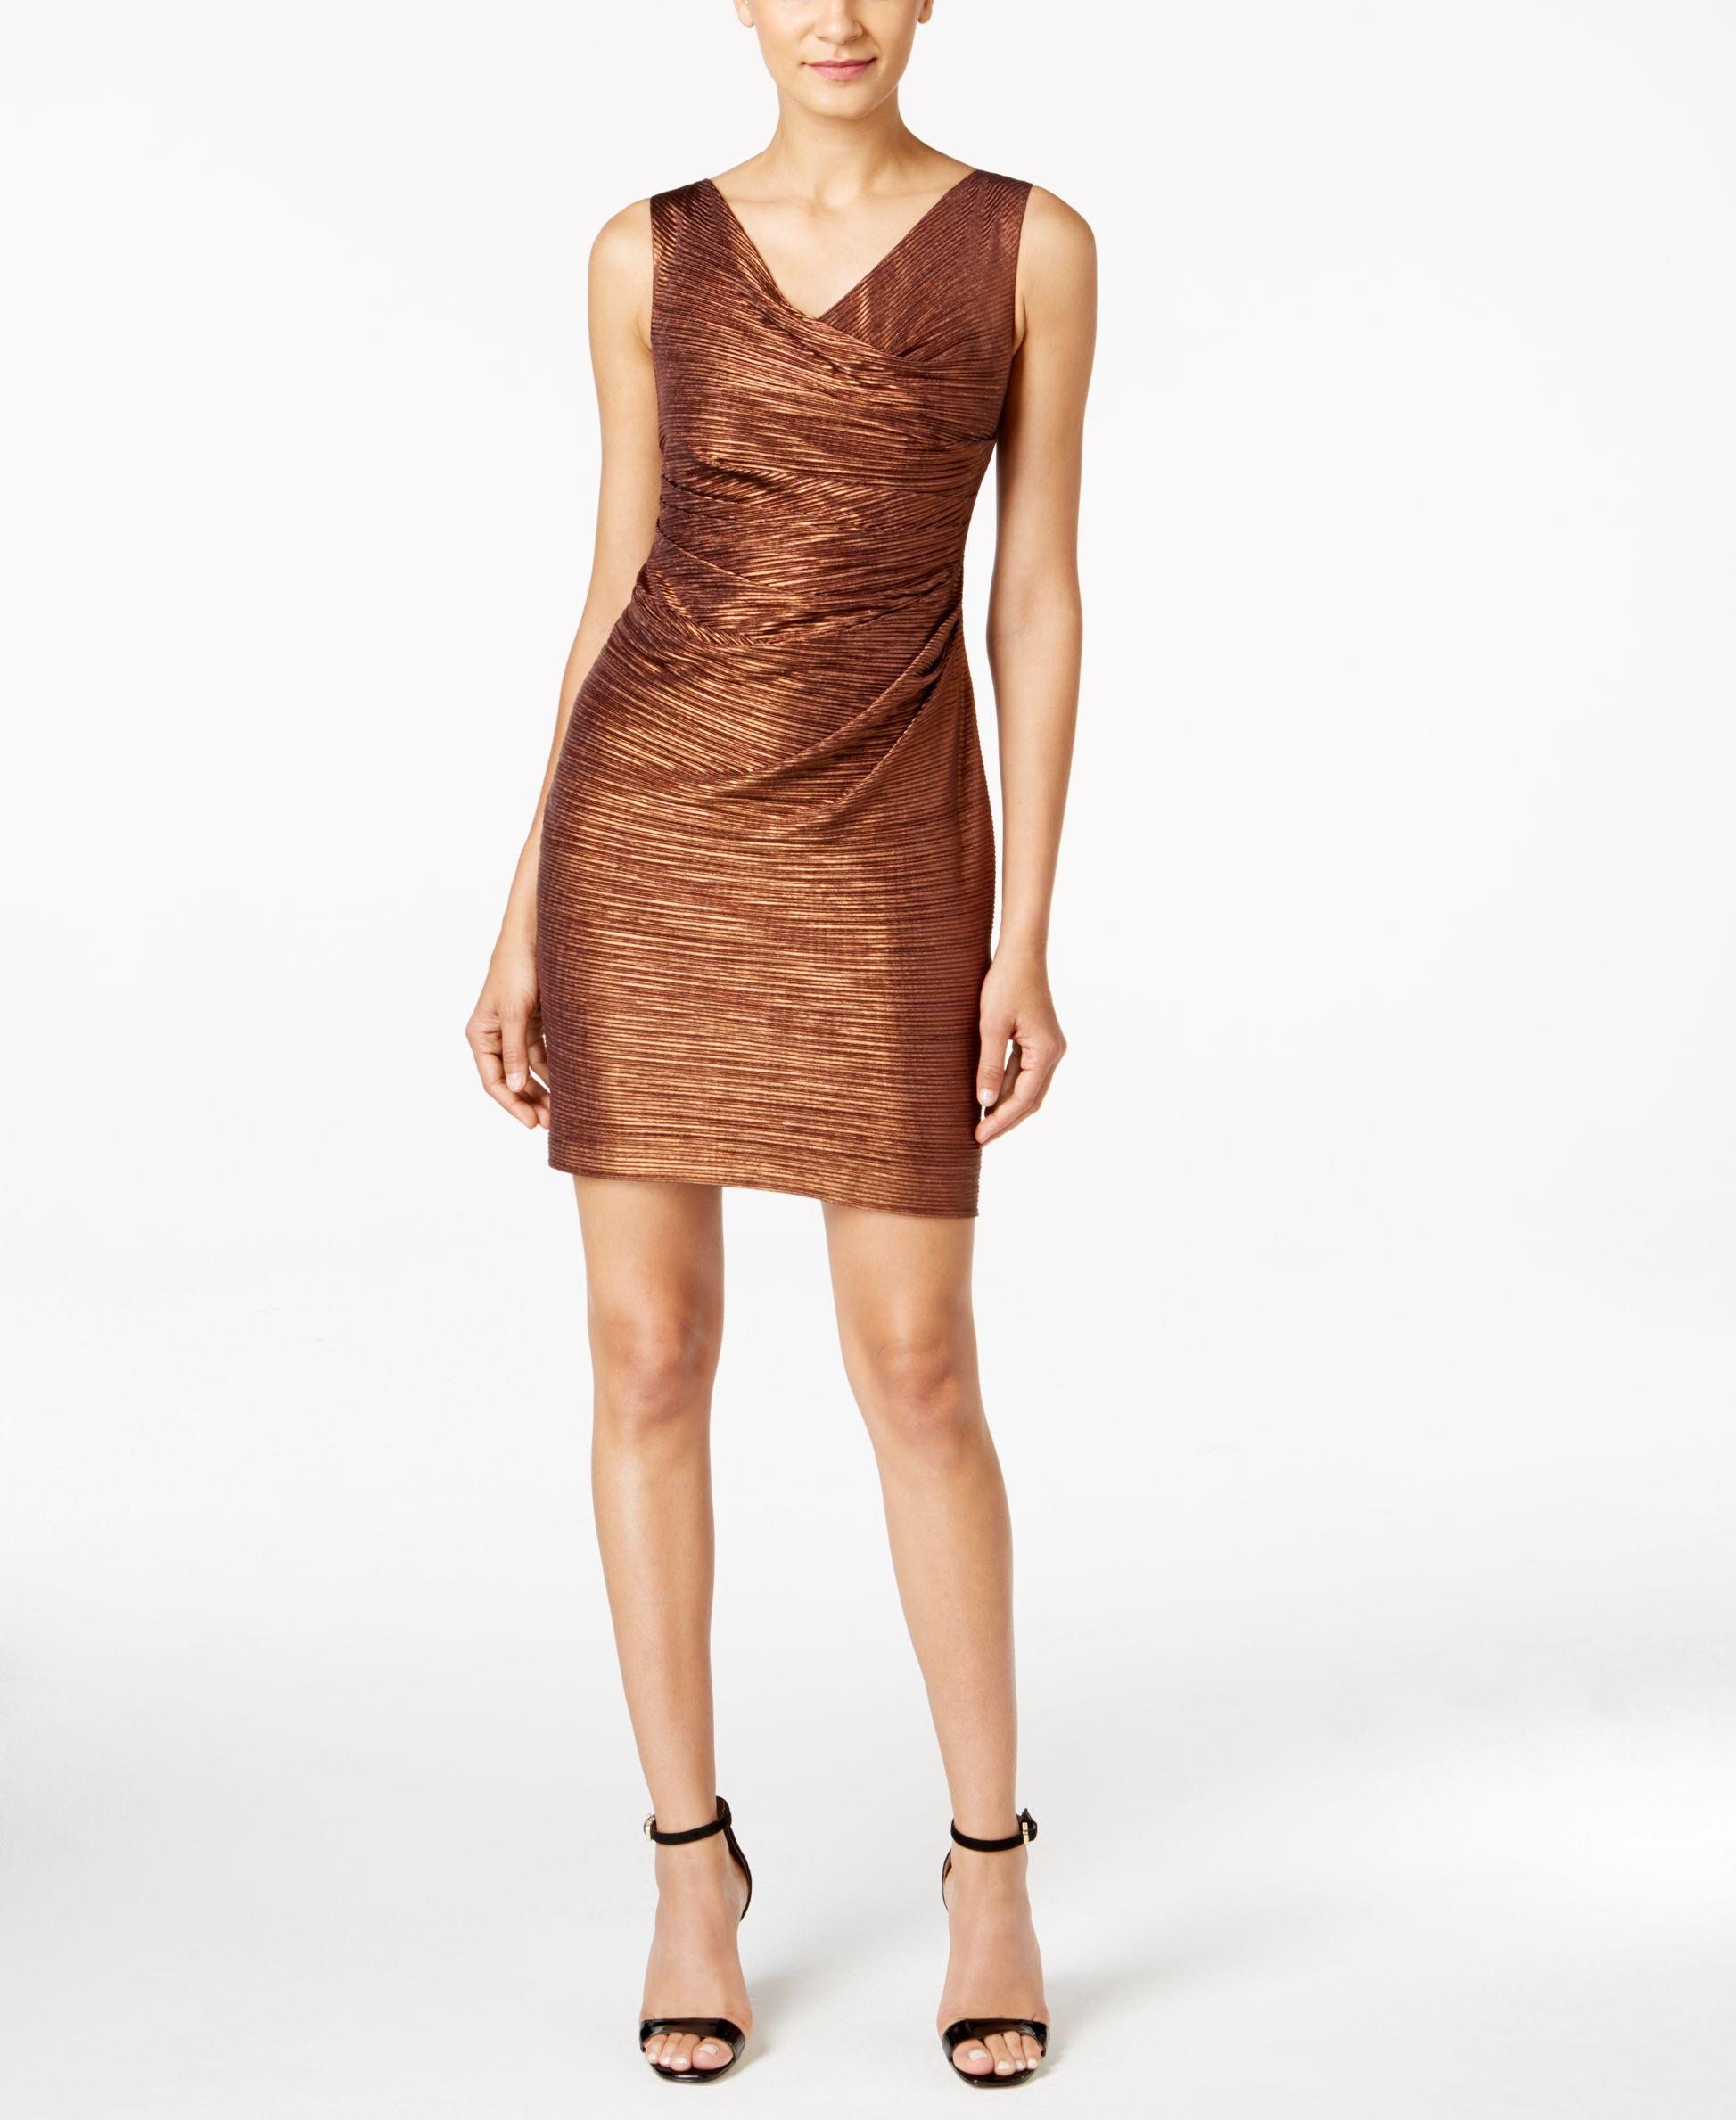 Lyst - Calvin Klein Draped Plisse Cocktail Dress in Brown